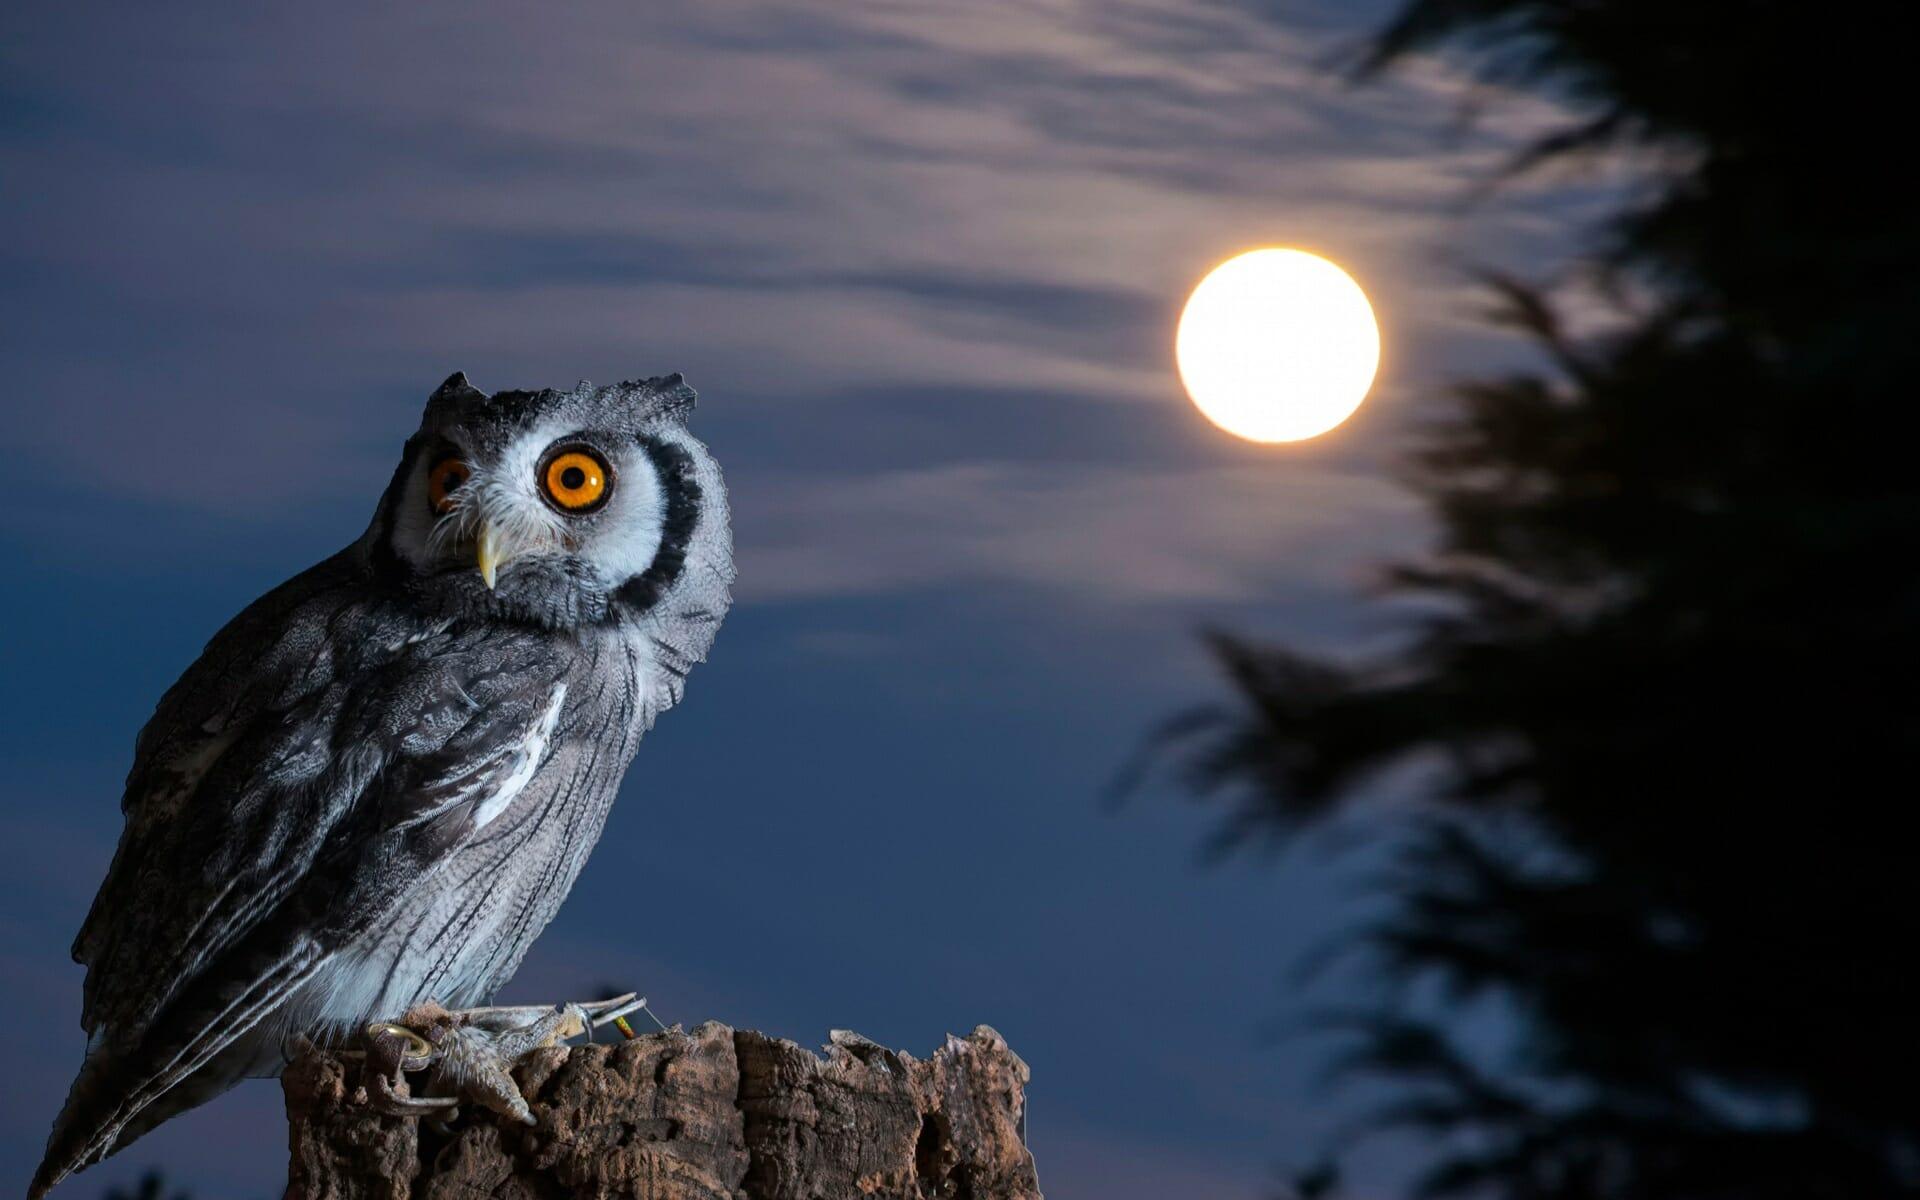 where do birds go at night